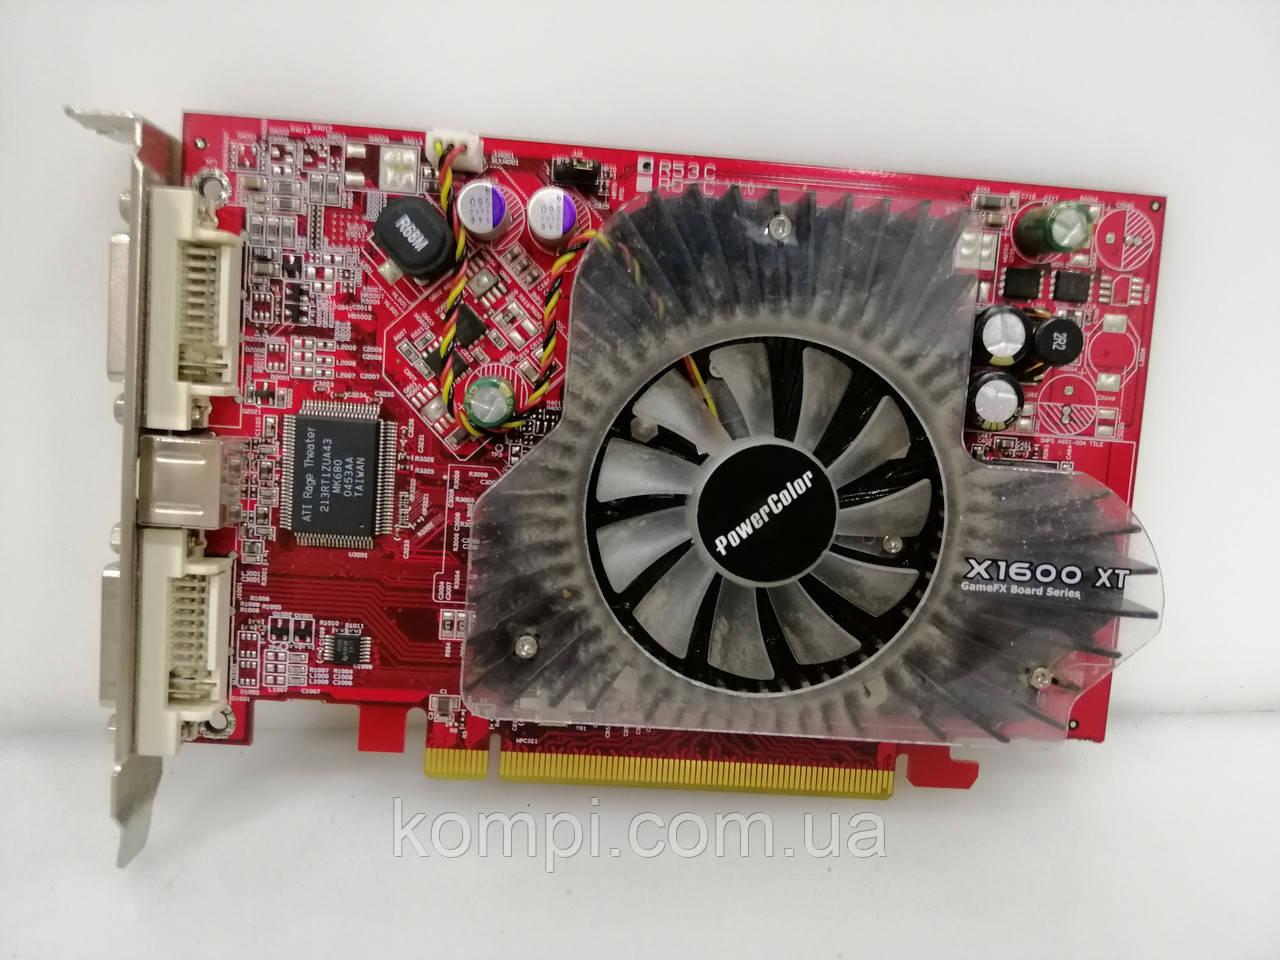 Видеокарта ATI RADEON X1600XT 256MB PCI-E